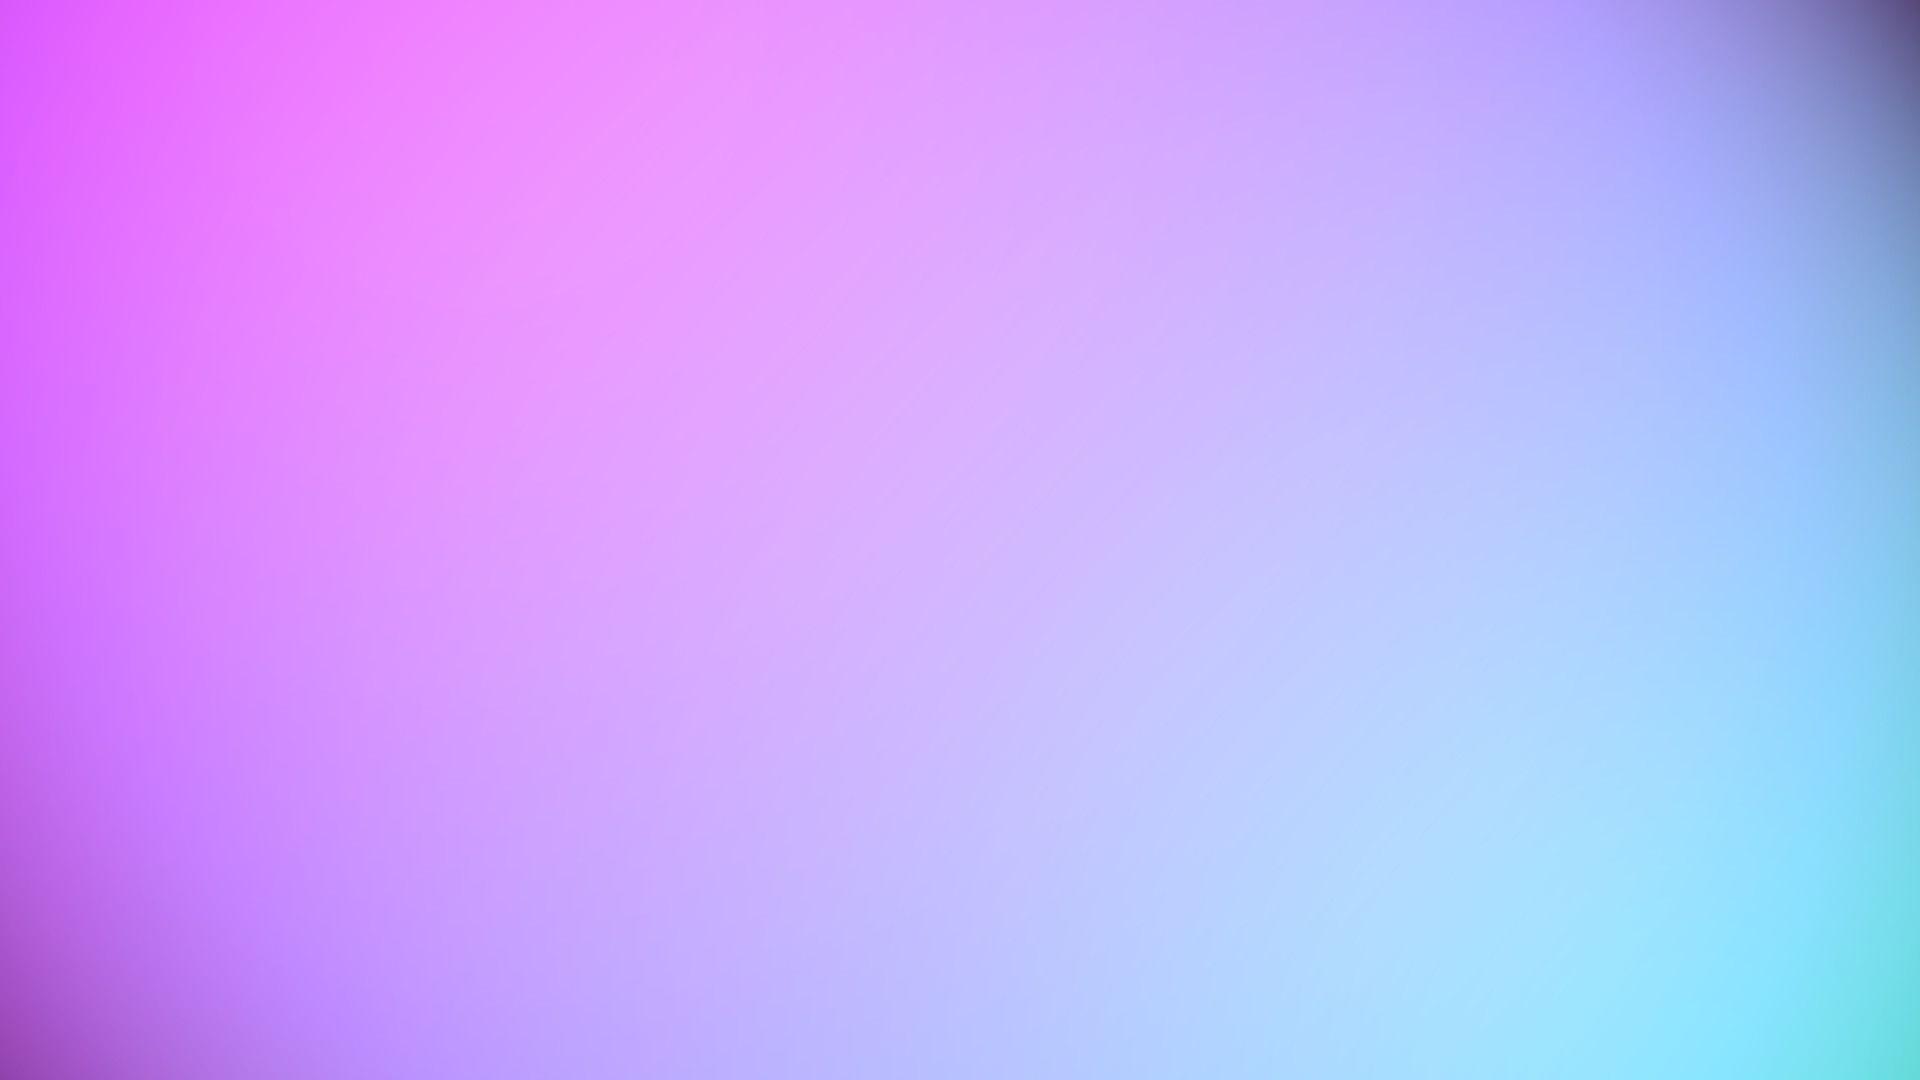 1920x1080 pink gradient hd wallpaper 1920x1080 wallpaper